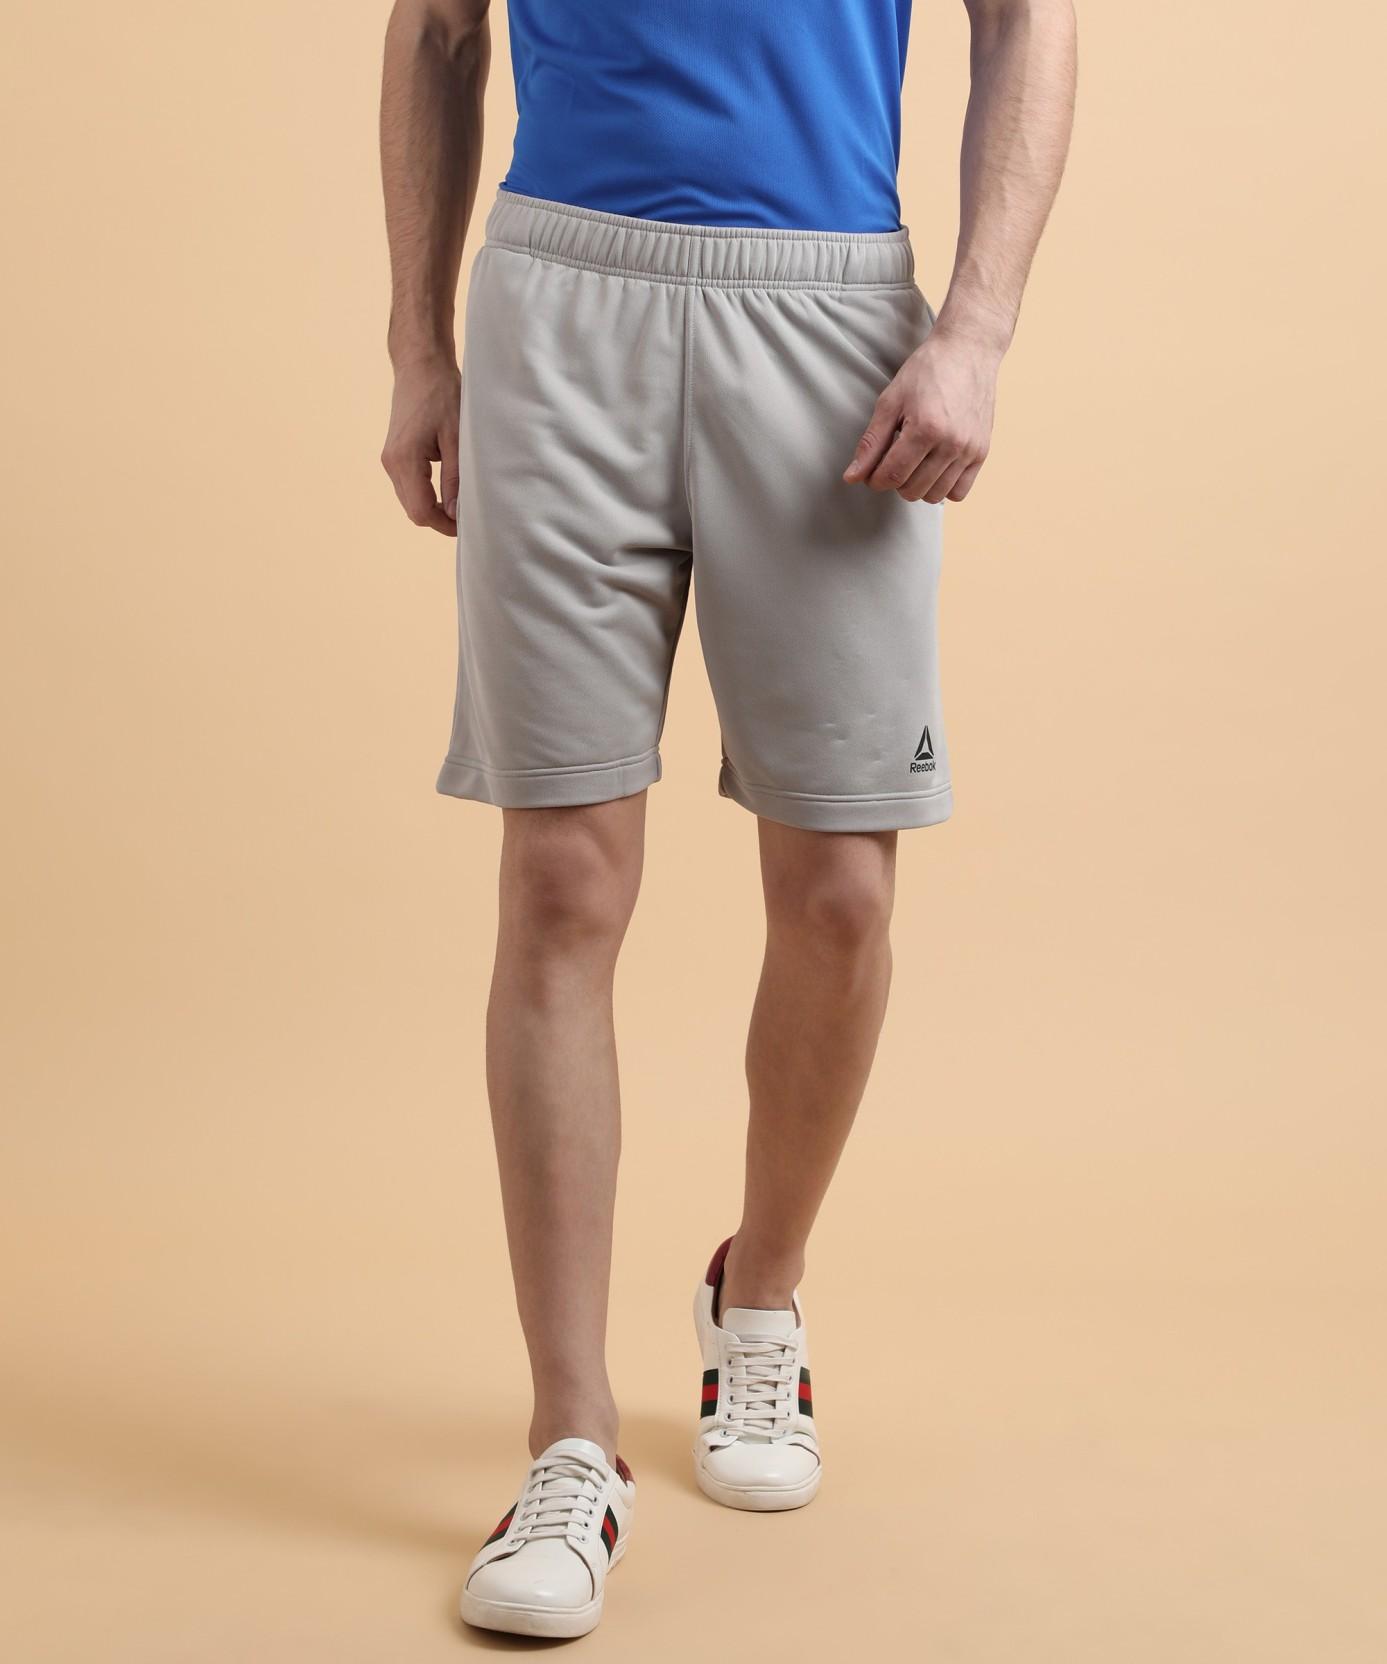 14547047e04a REEBOK Solid Men Grey Sports Shorts - Buy REEBOK Solid Men Grey ...